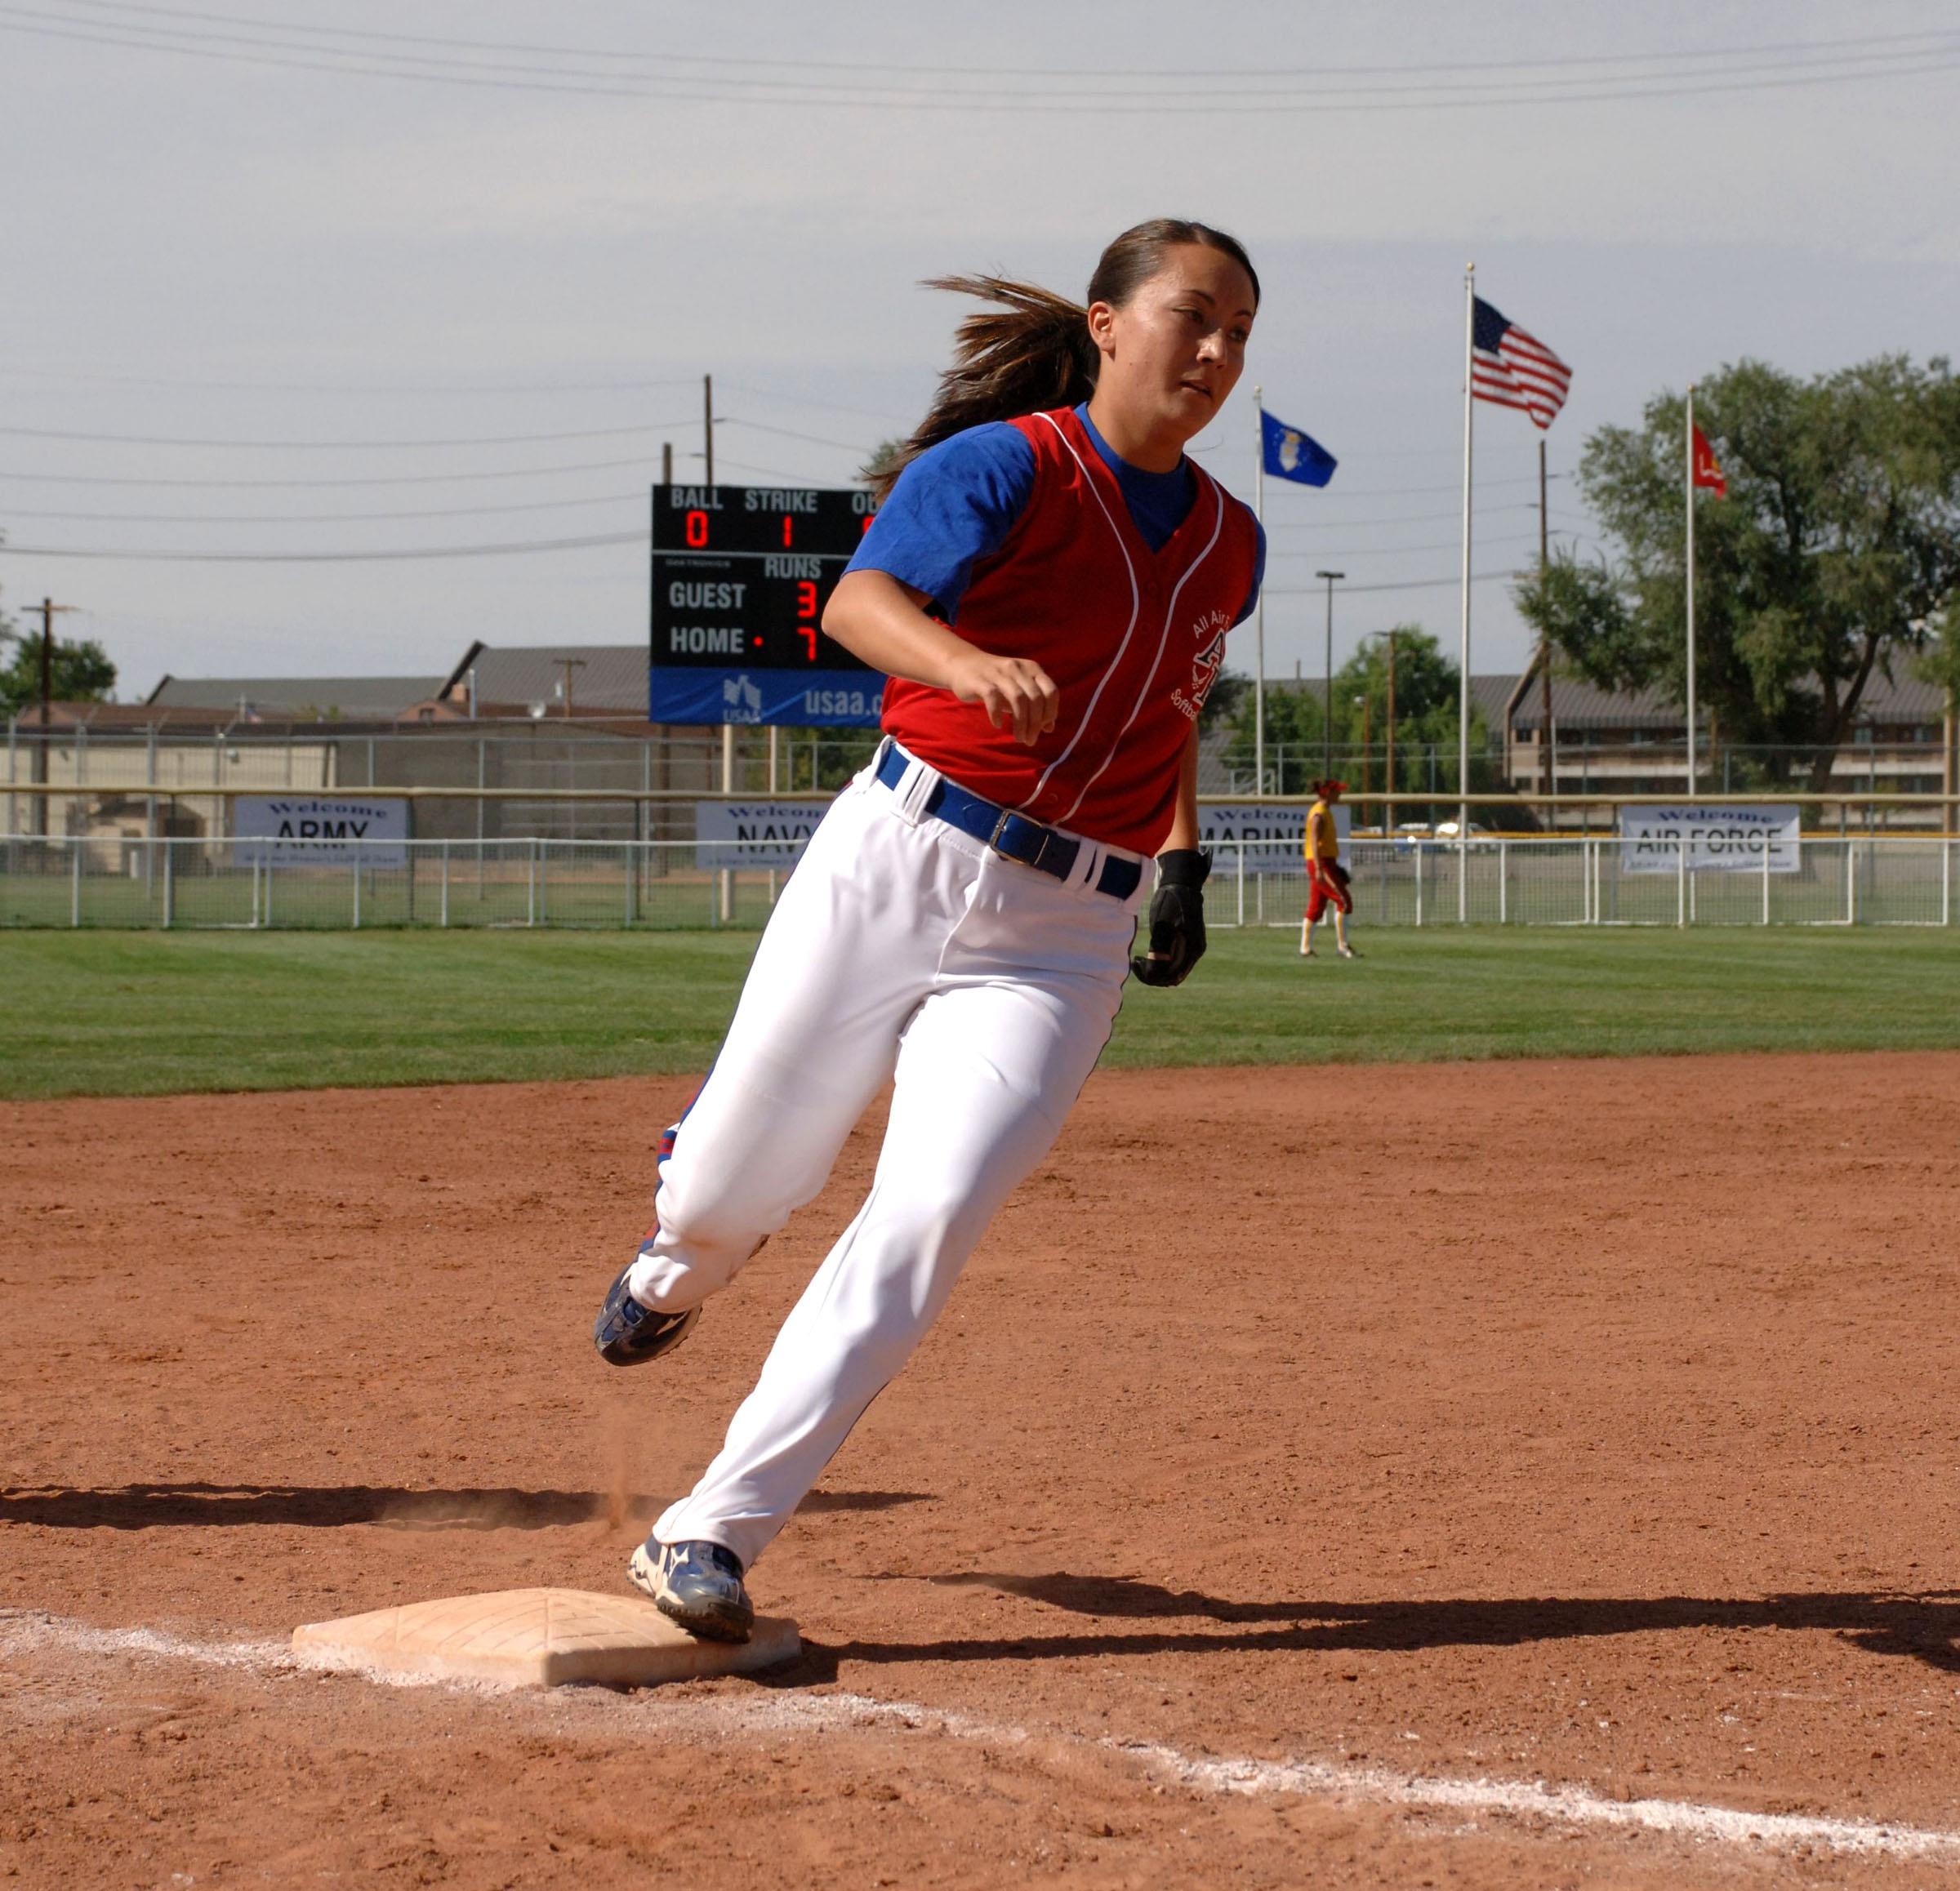 Runner on the field photo